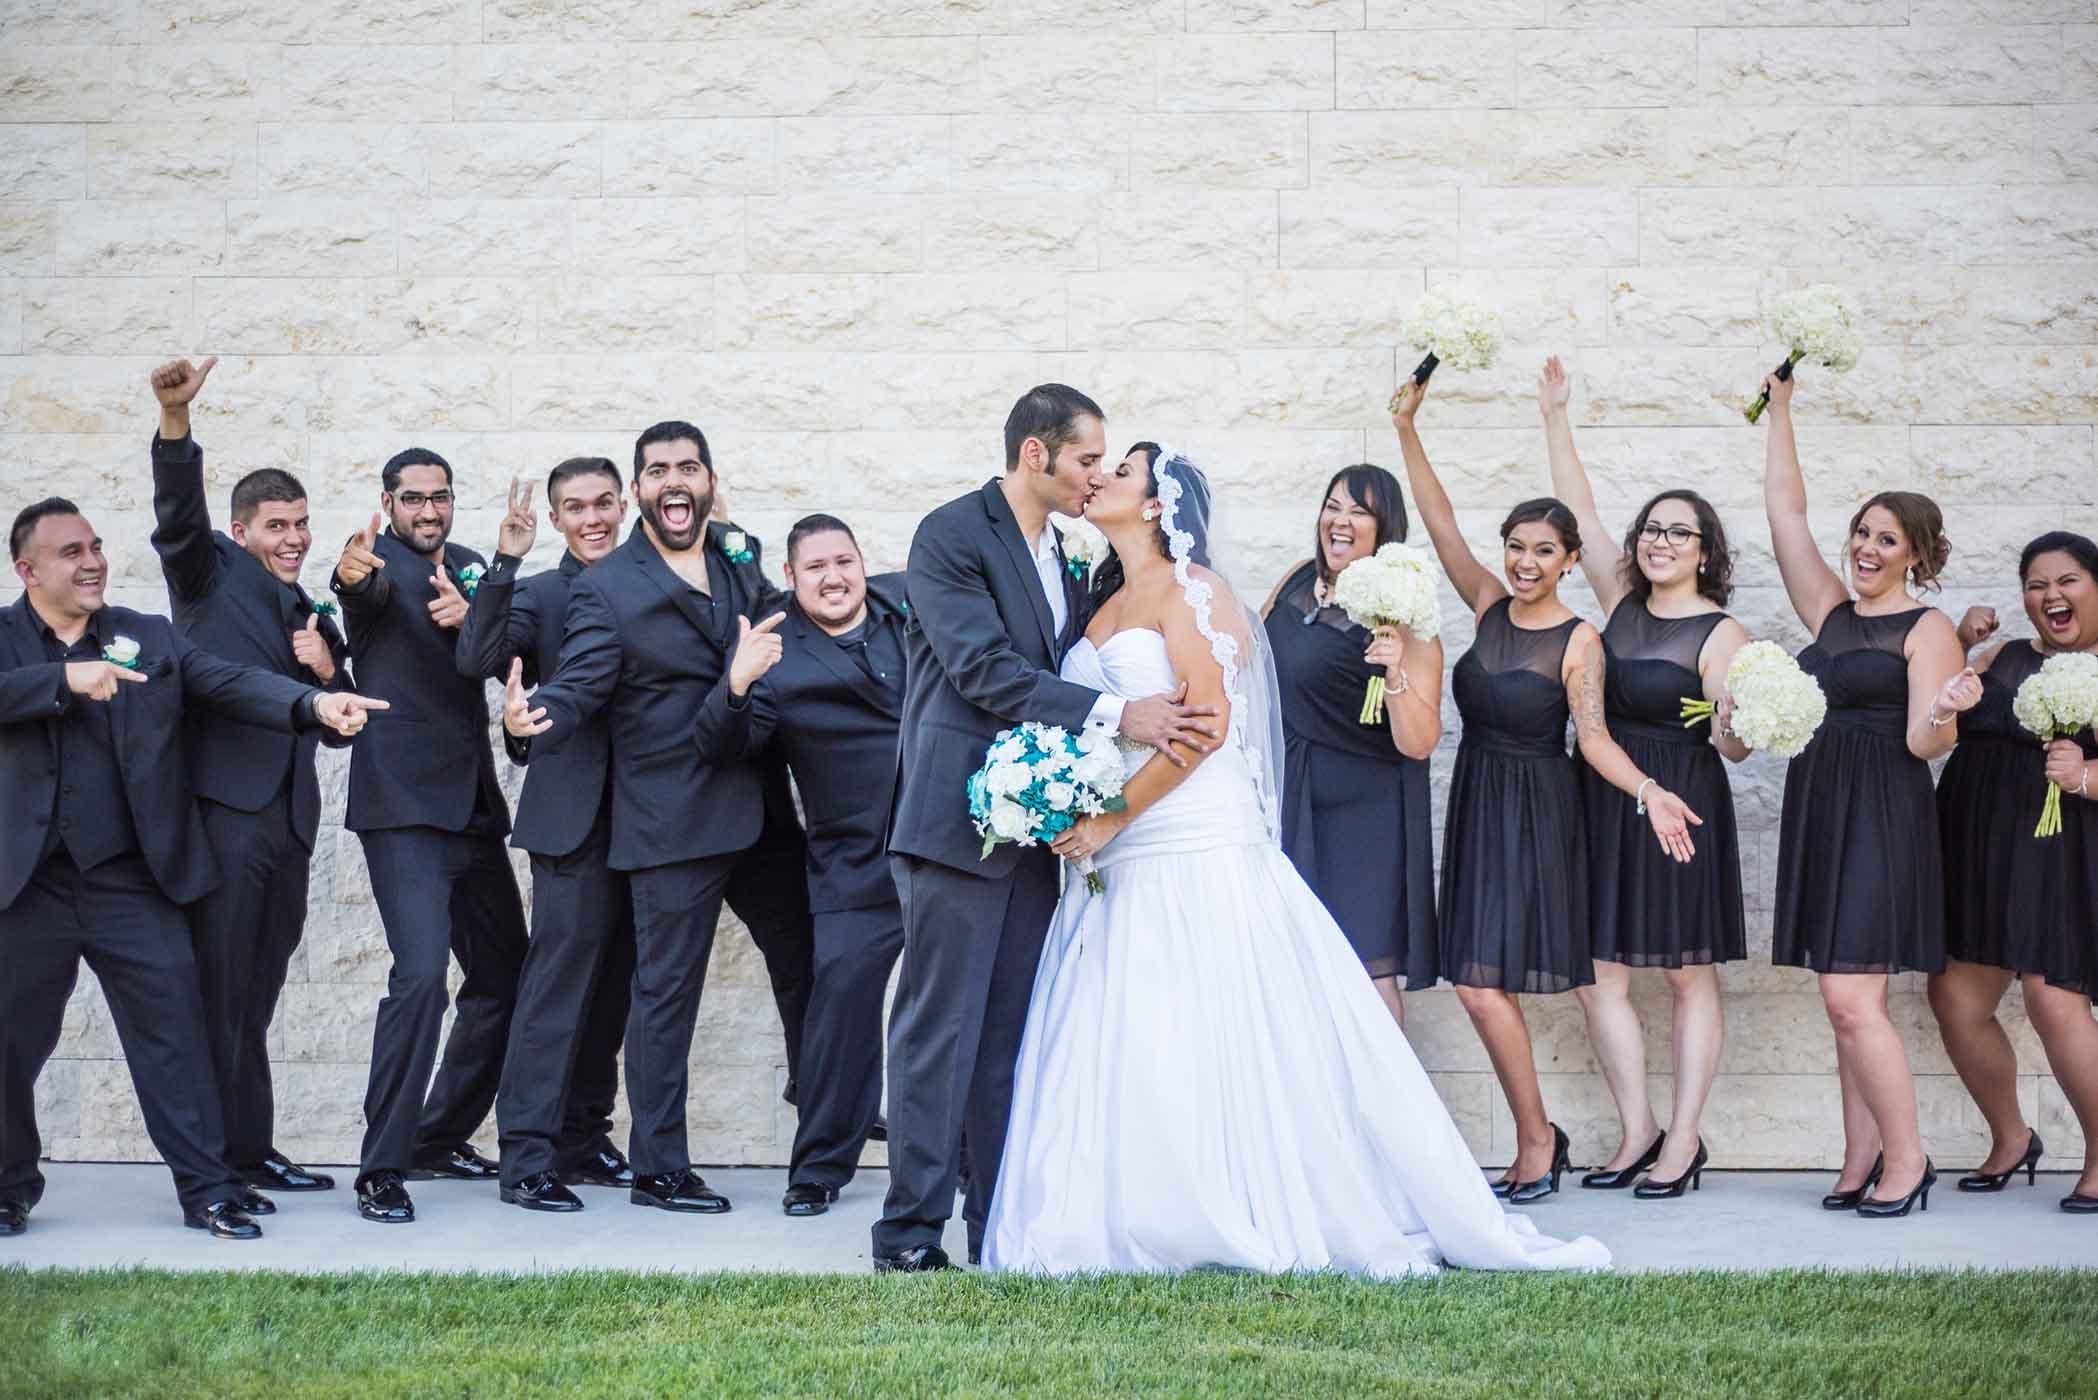 smlStef-+-Andy---Wed-Sept-25,-2015-323.jpg